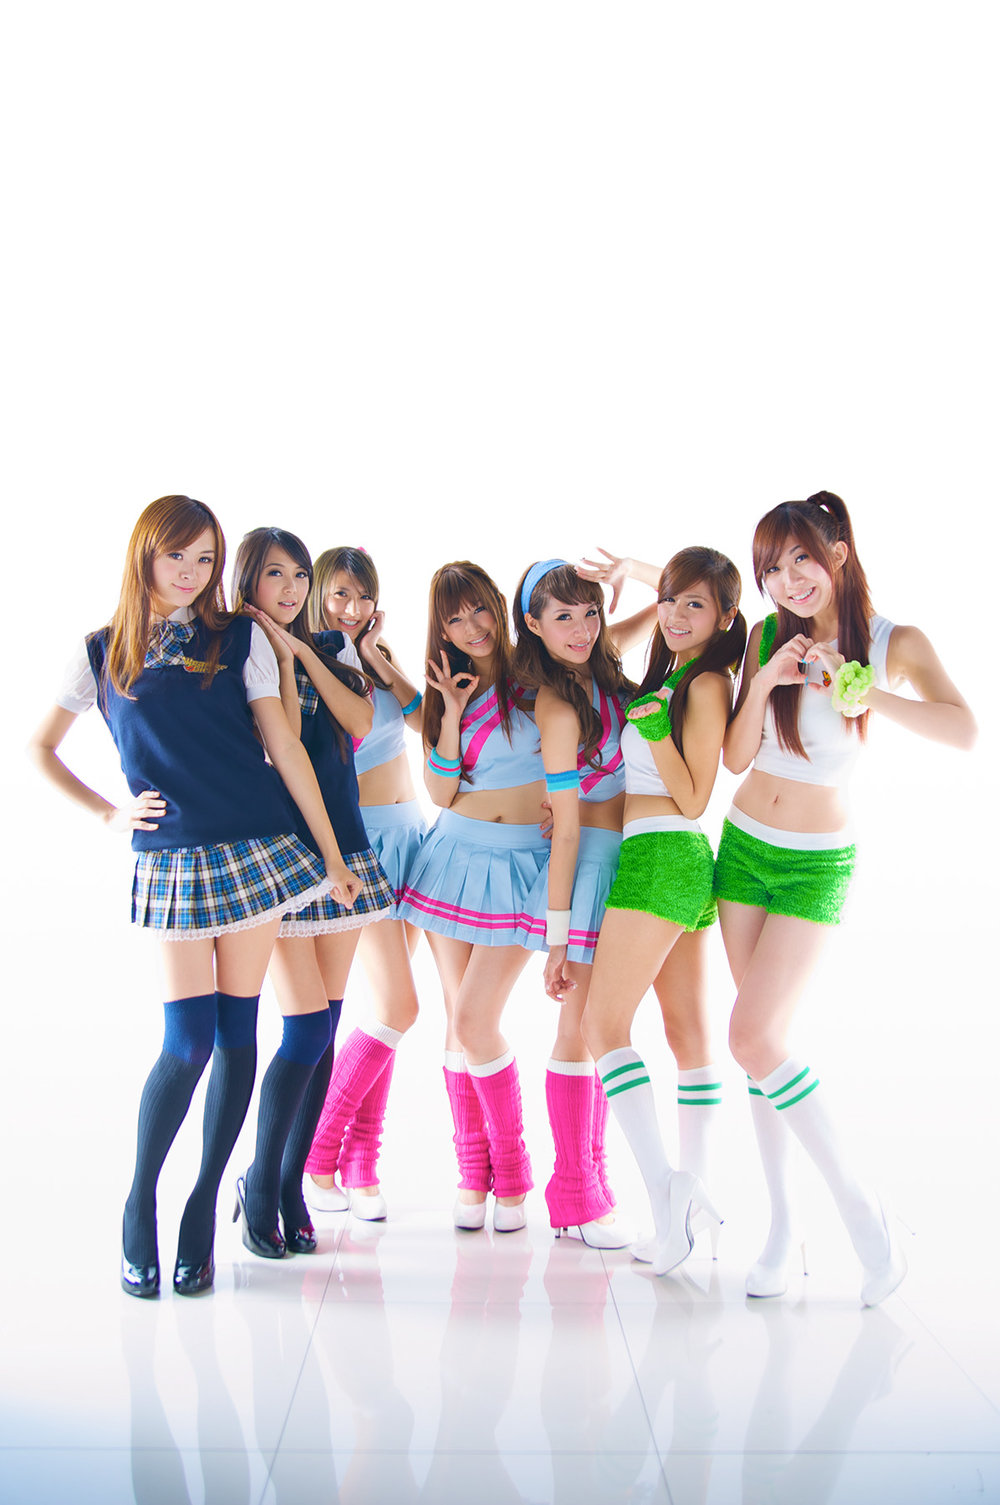 wathergirls-2.jpg